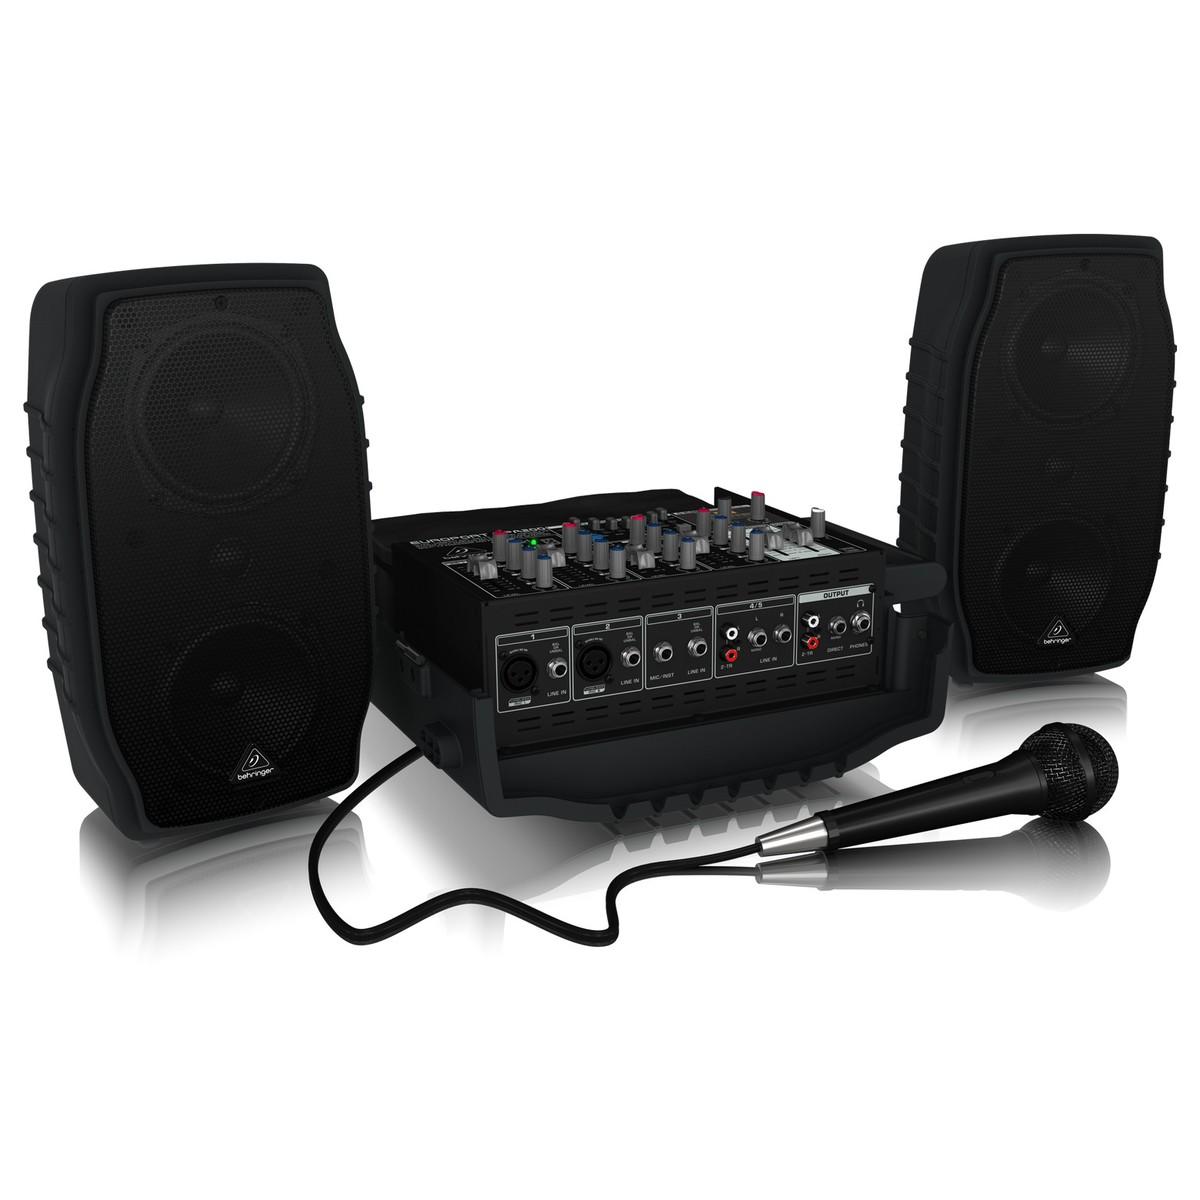 behringer europort ppa200 5 channel portable pa system at gear4music. Black Bedroom Furniture Sets. Home Design Ideas